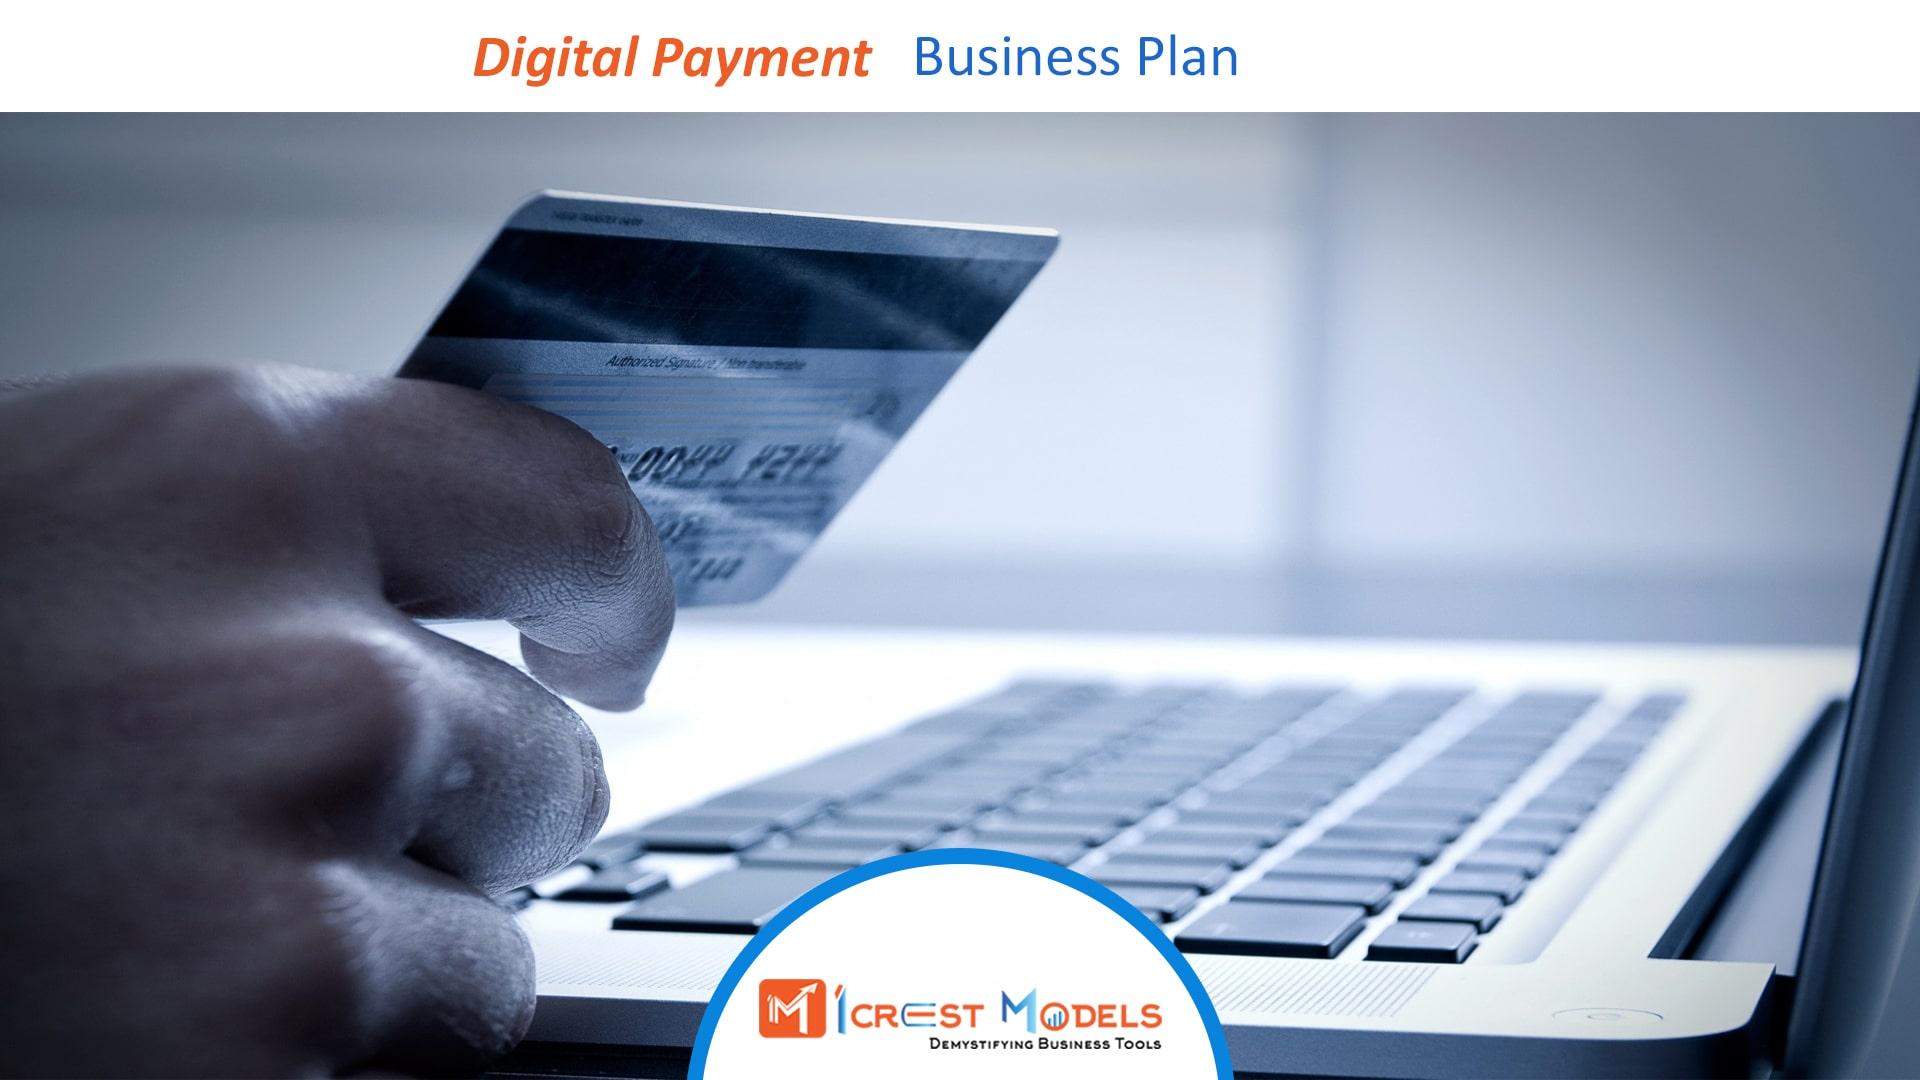 Digital Payment Business Plan